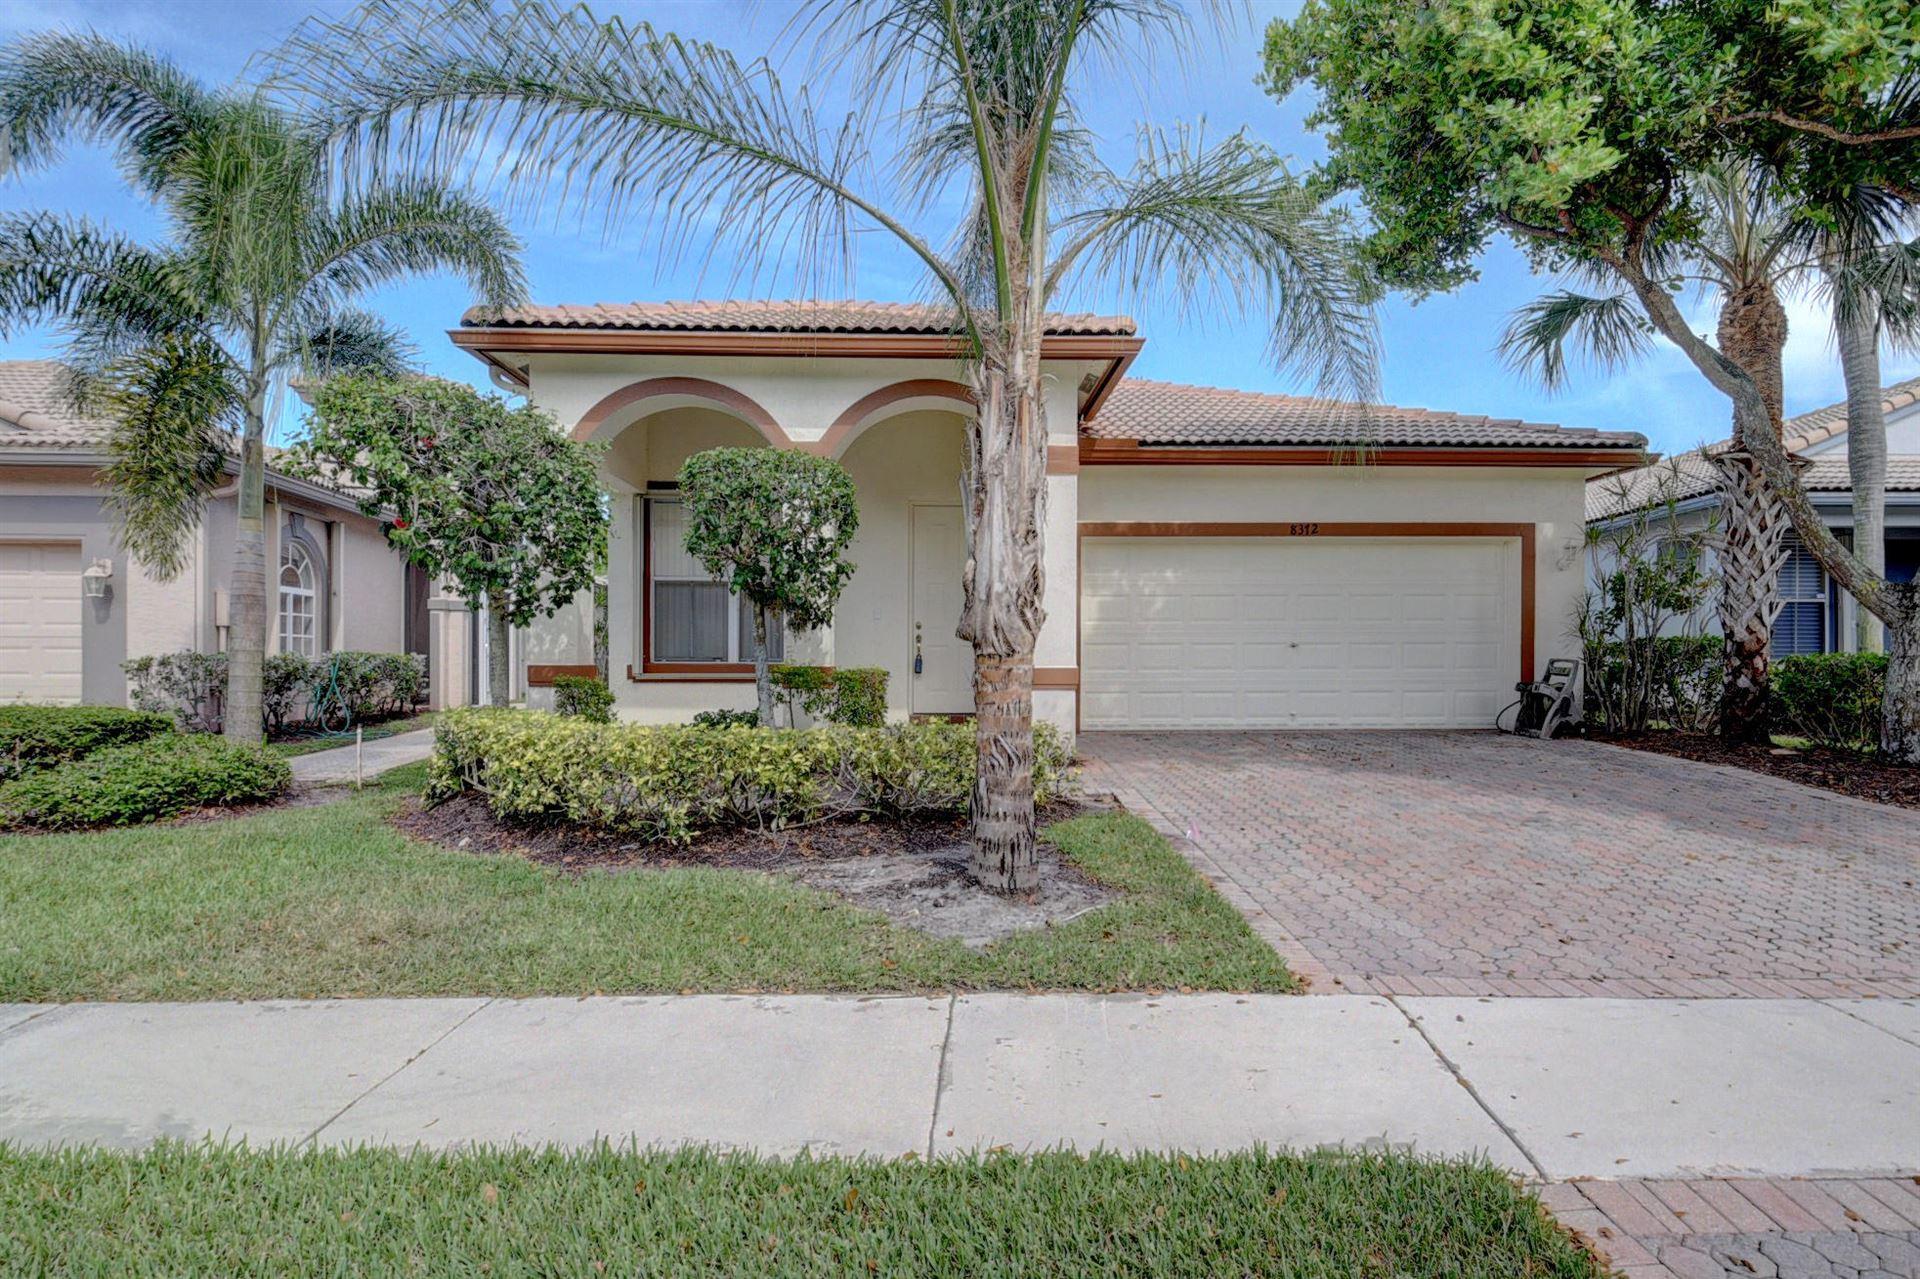 8372 Siciliano Street, Boynton Beach, FL 33472 - MLS#: RX-10715888